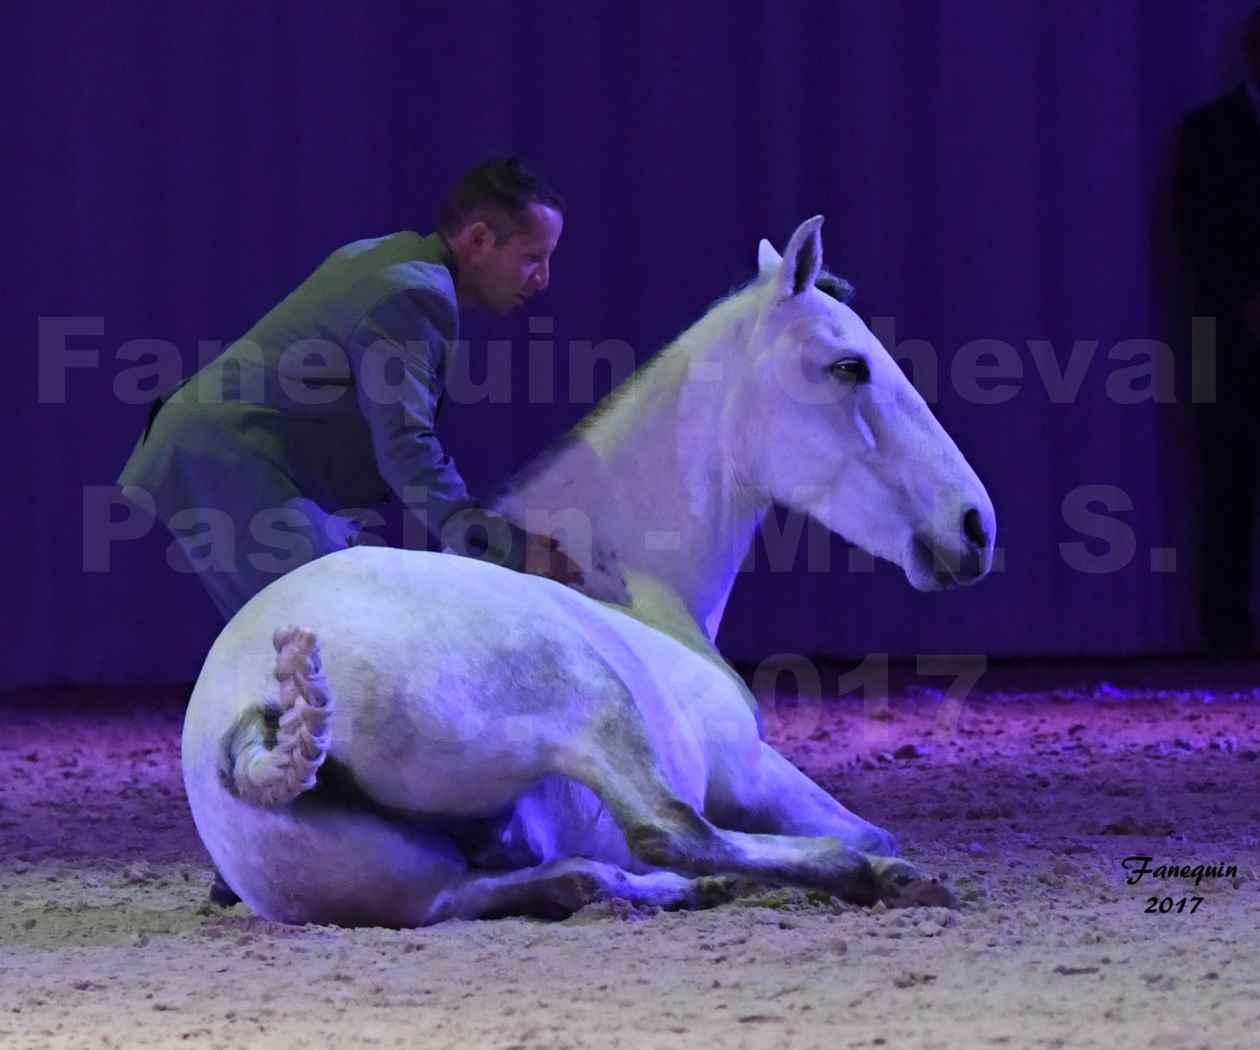 Cheval Passion 2017 - M. I. S. E. C. - Ludovic LONGO & 1 cheval en liberté - 18